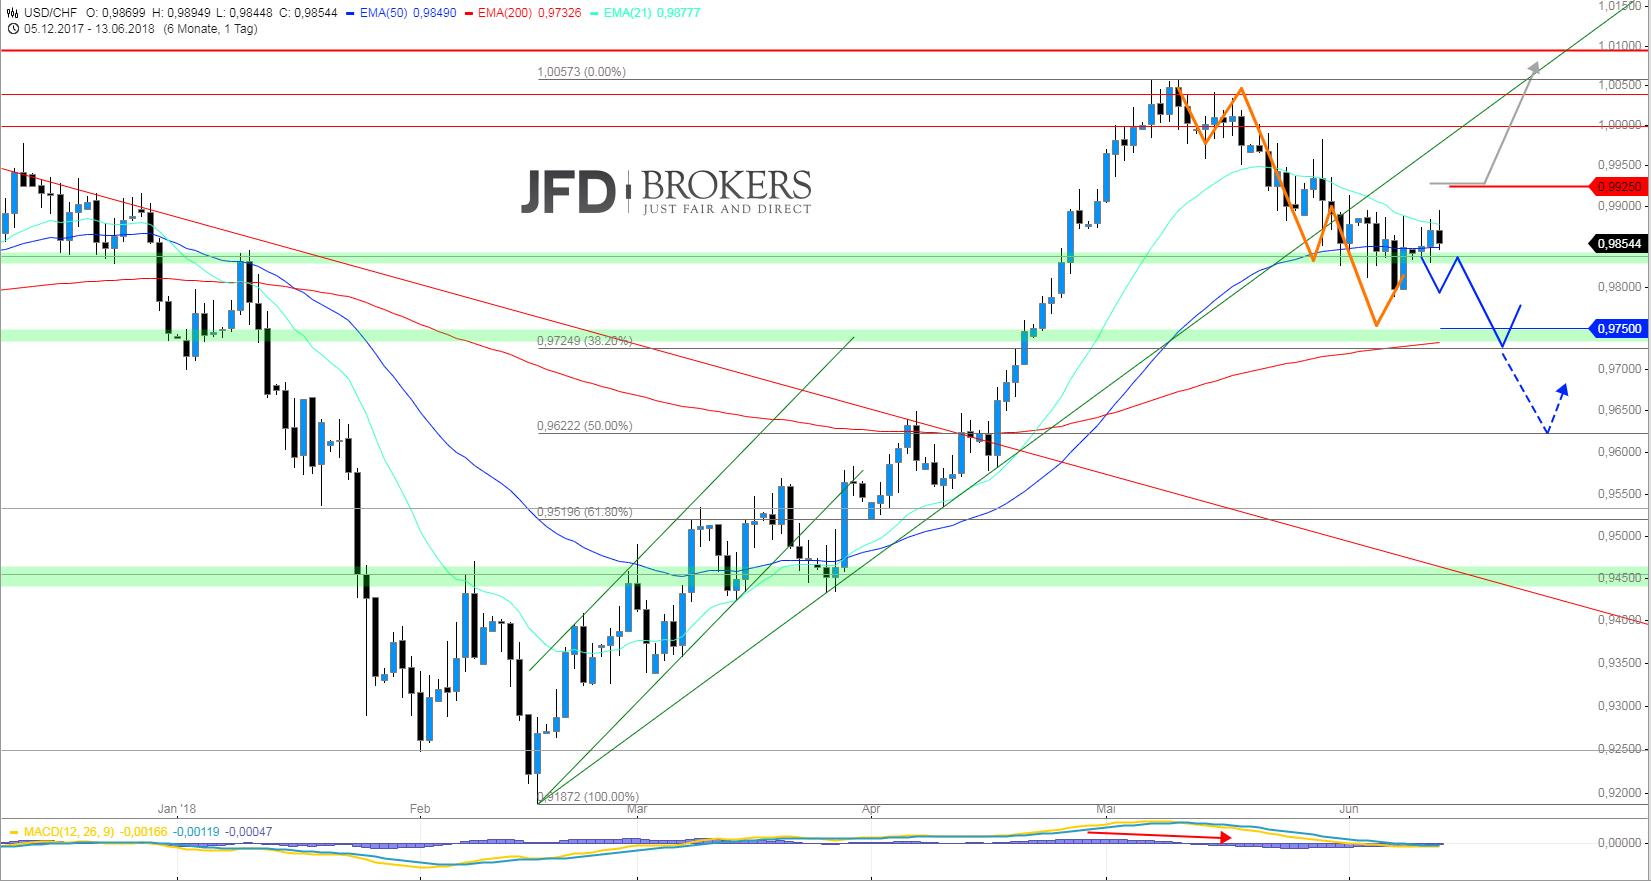 USD-CHF-Trade-Update-vor-FED-Sitzung-Chartanalyse-Christian-Kämmerer-GodmodeTrader.de-1